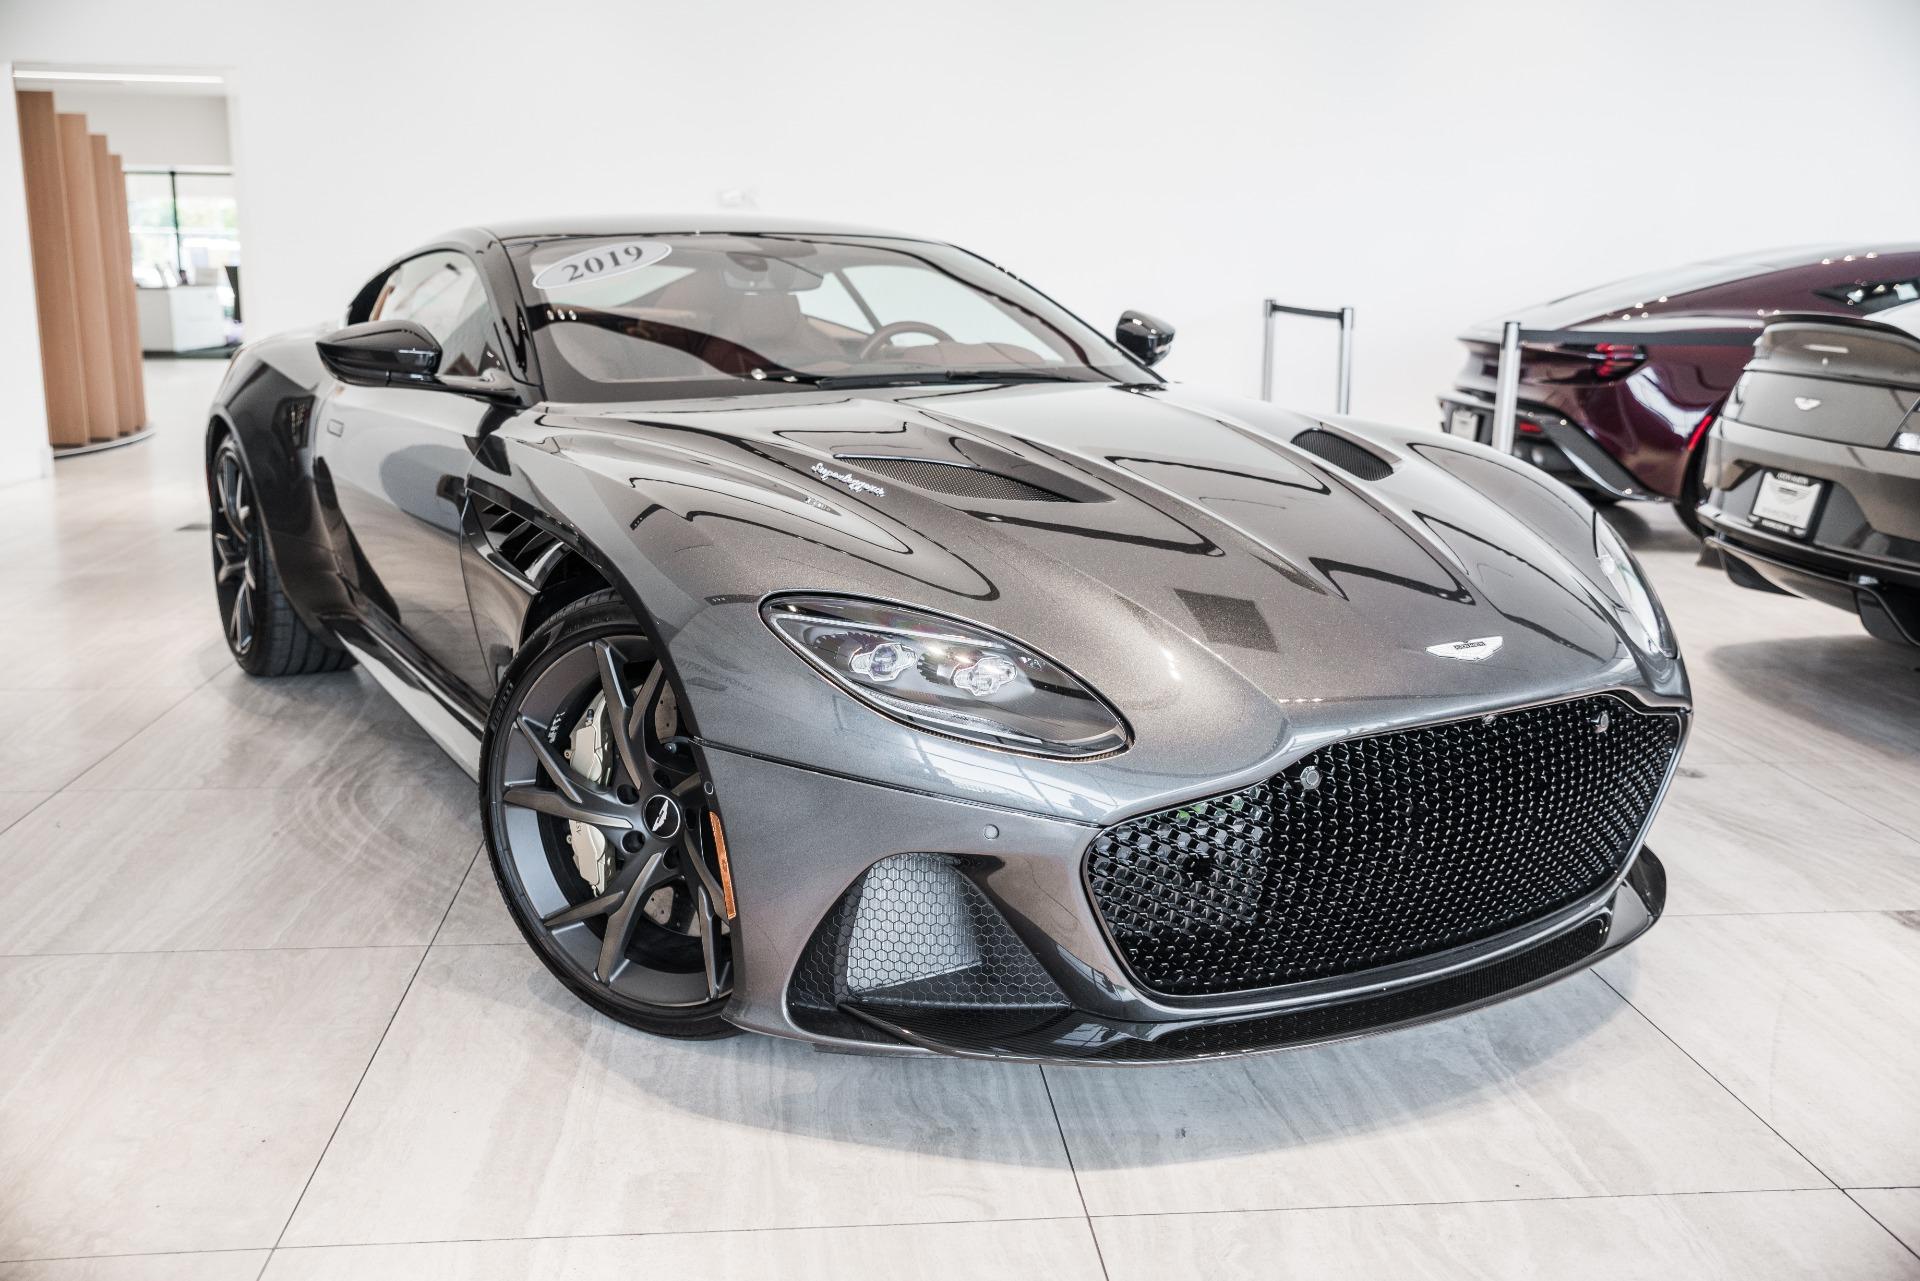 2019 Aston Martin Dbs Superleggera Stock Pr00030 For Sale Near Vienna Va Va Aston Martin Dealer